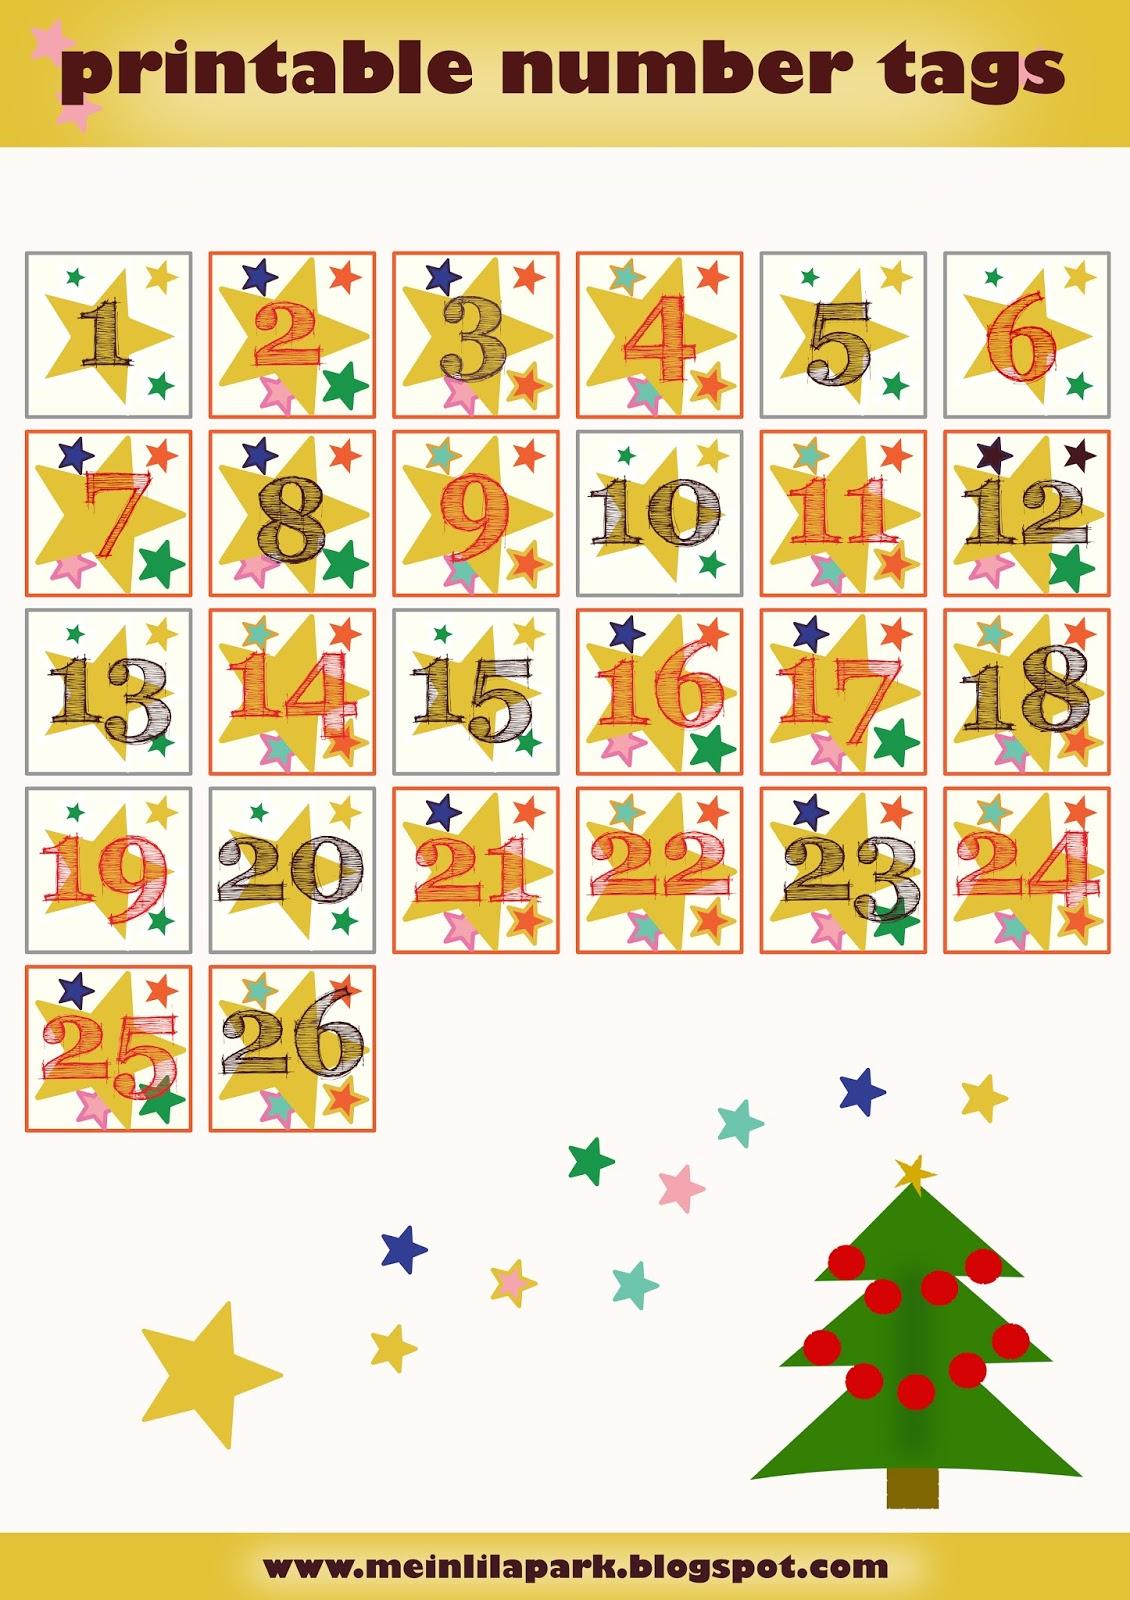 Diy Calendar Numbers : Free printable advent calendar numbers zahlen für